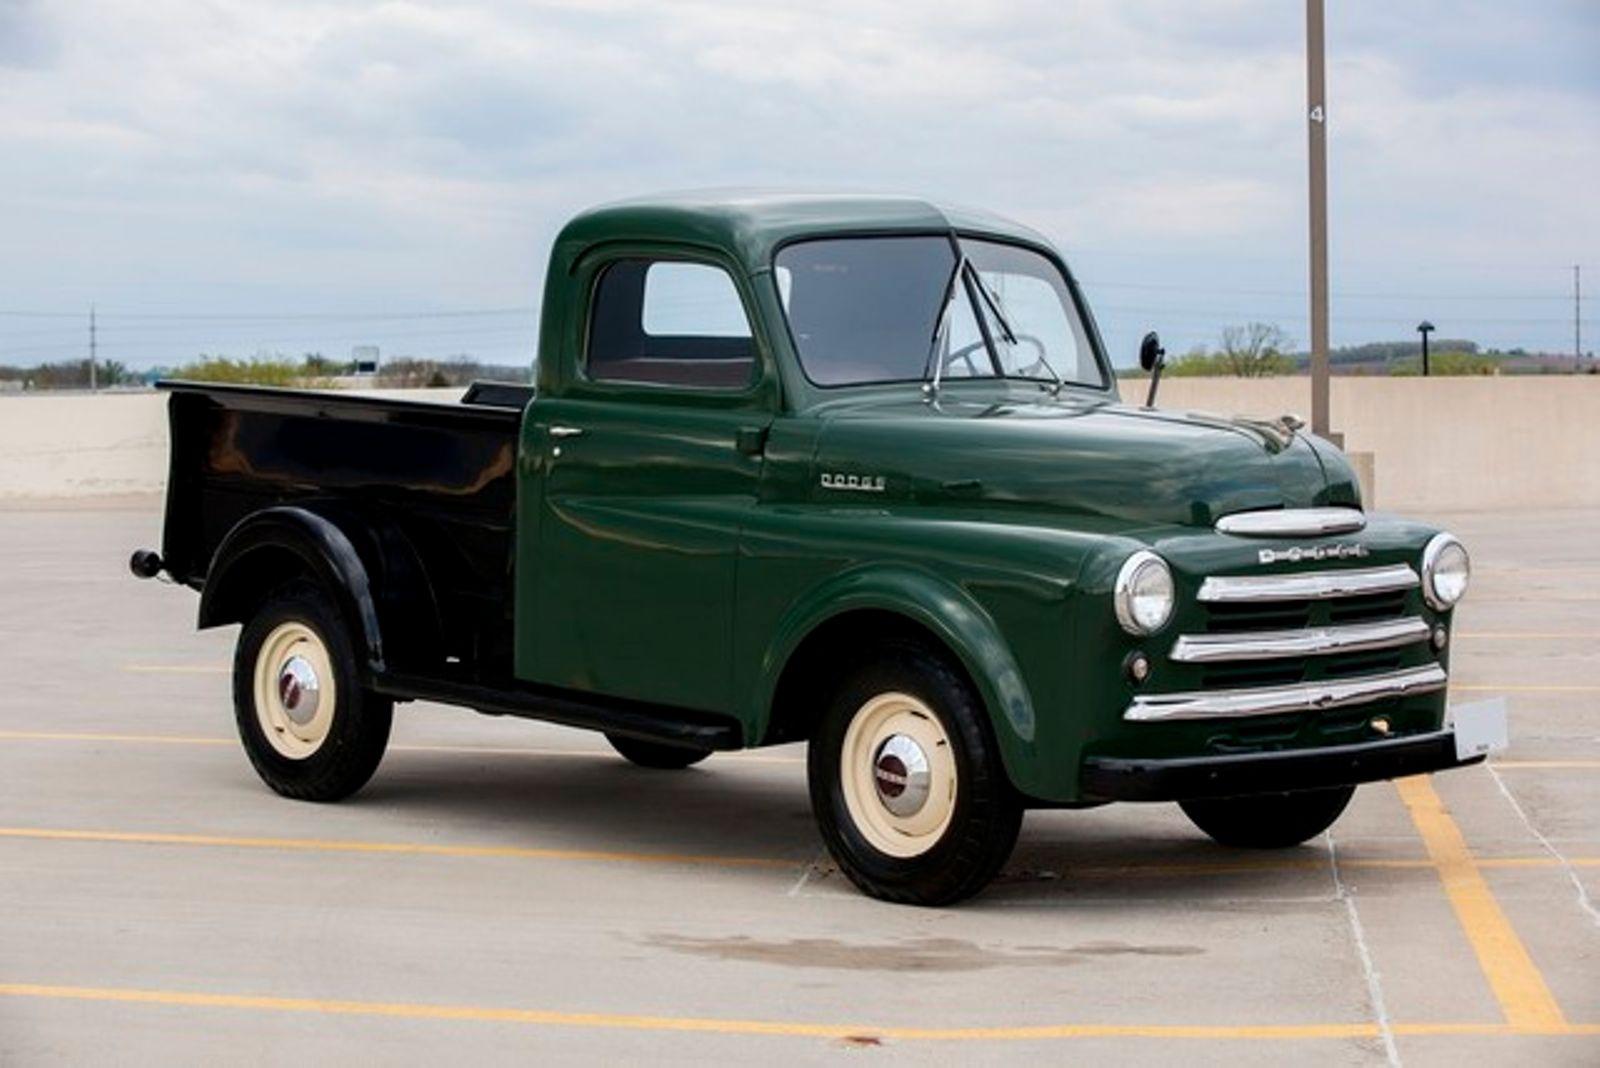 1948 Dodge Short Bed Michaelieclark 1949 D100 Truck 100 3 4 Ton Box In Rowlett Texas